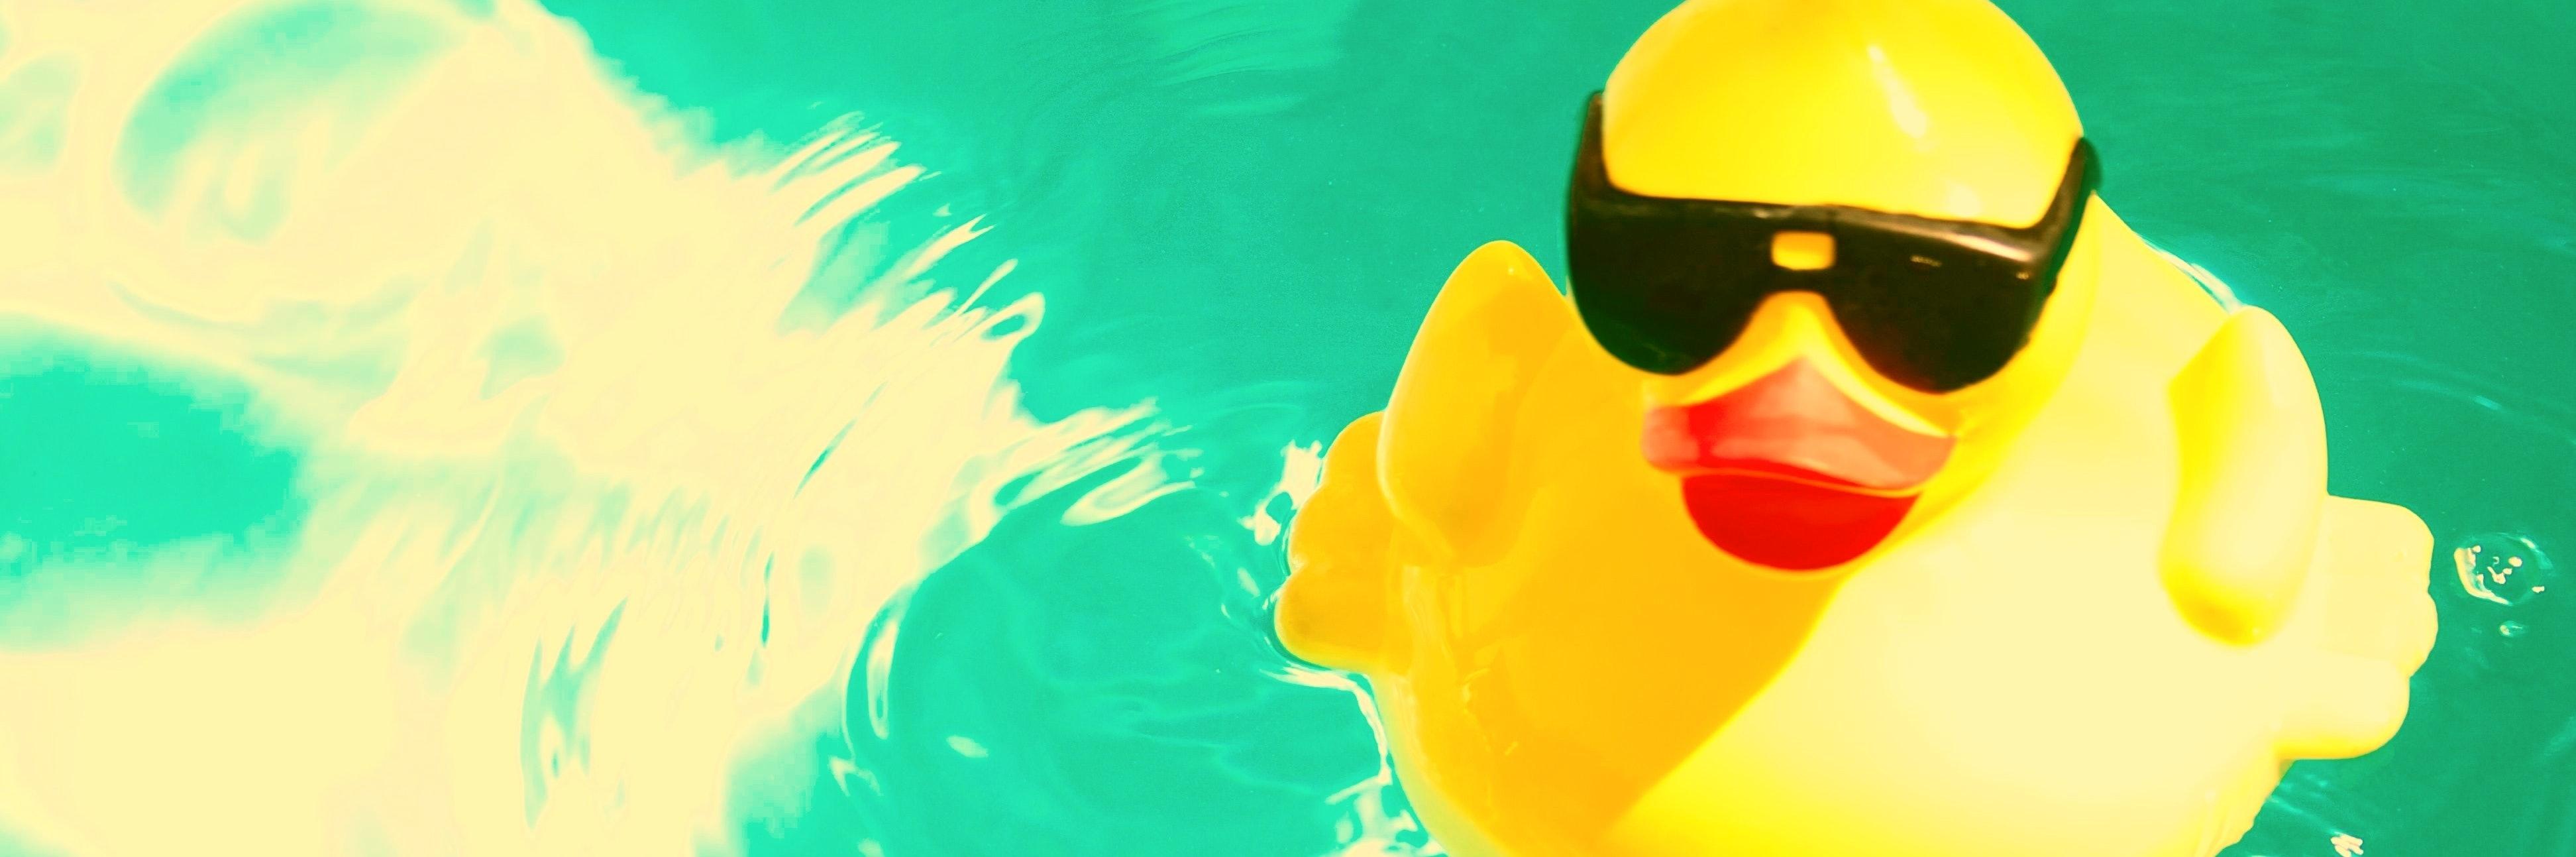 Rubber Ducky Alone